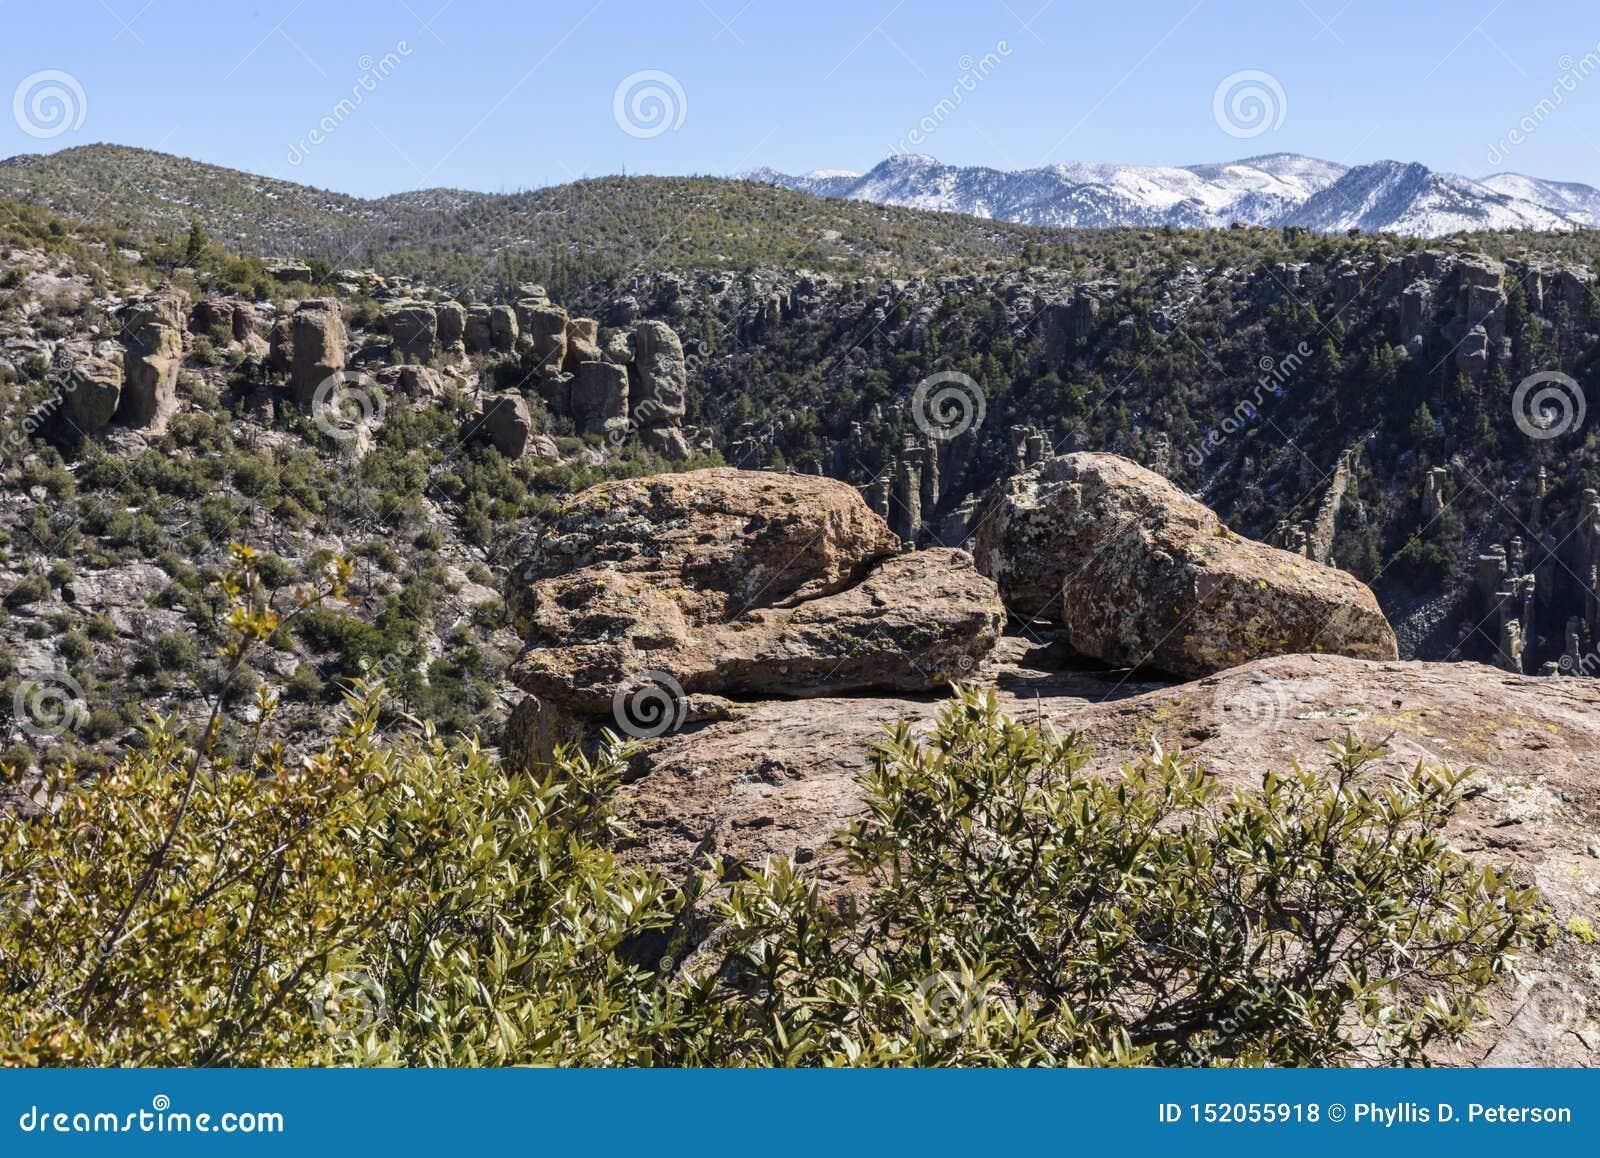 Hoodoos in the Chiricahua National Monument